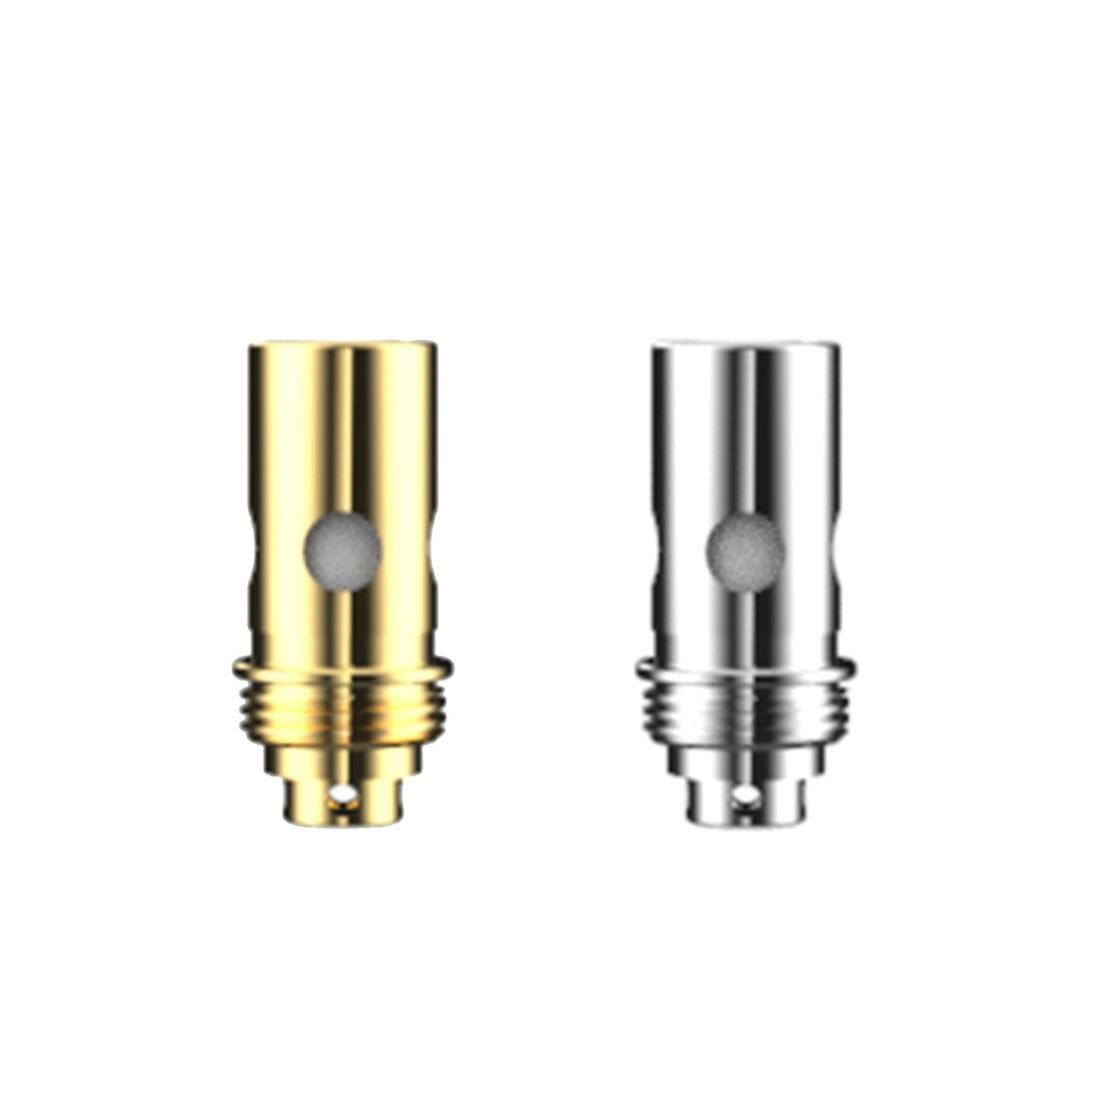 Innokin - Sceptre coil